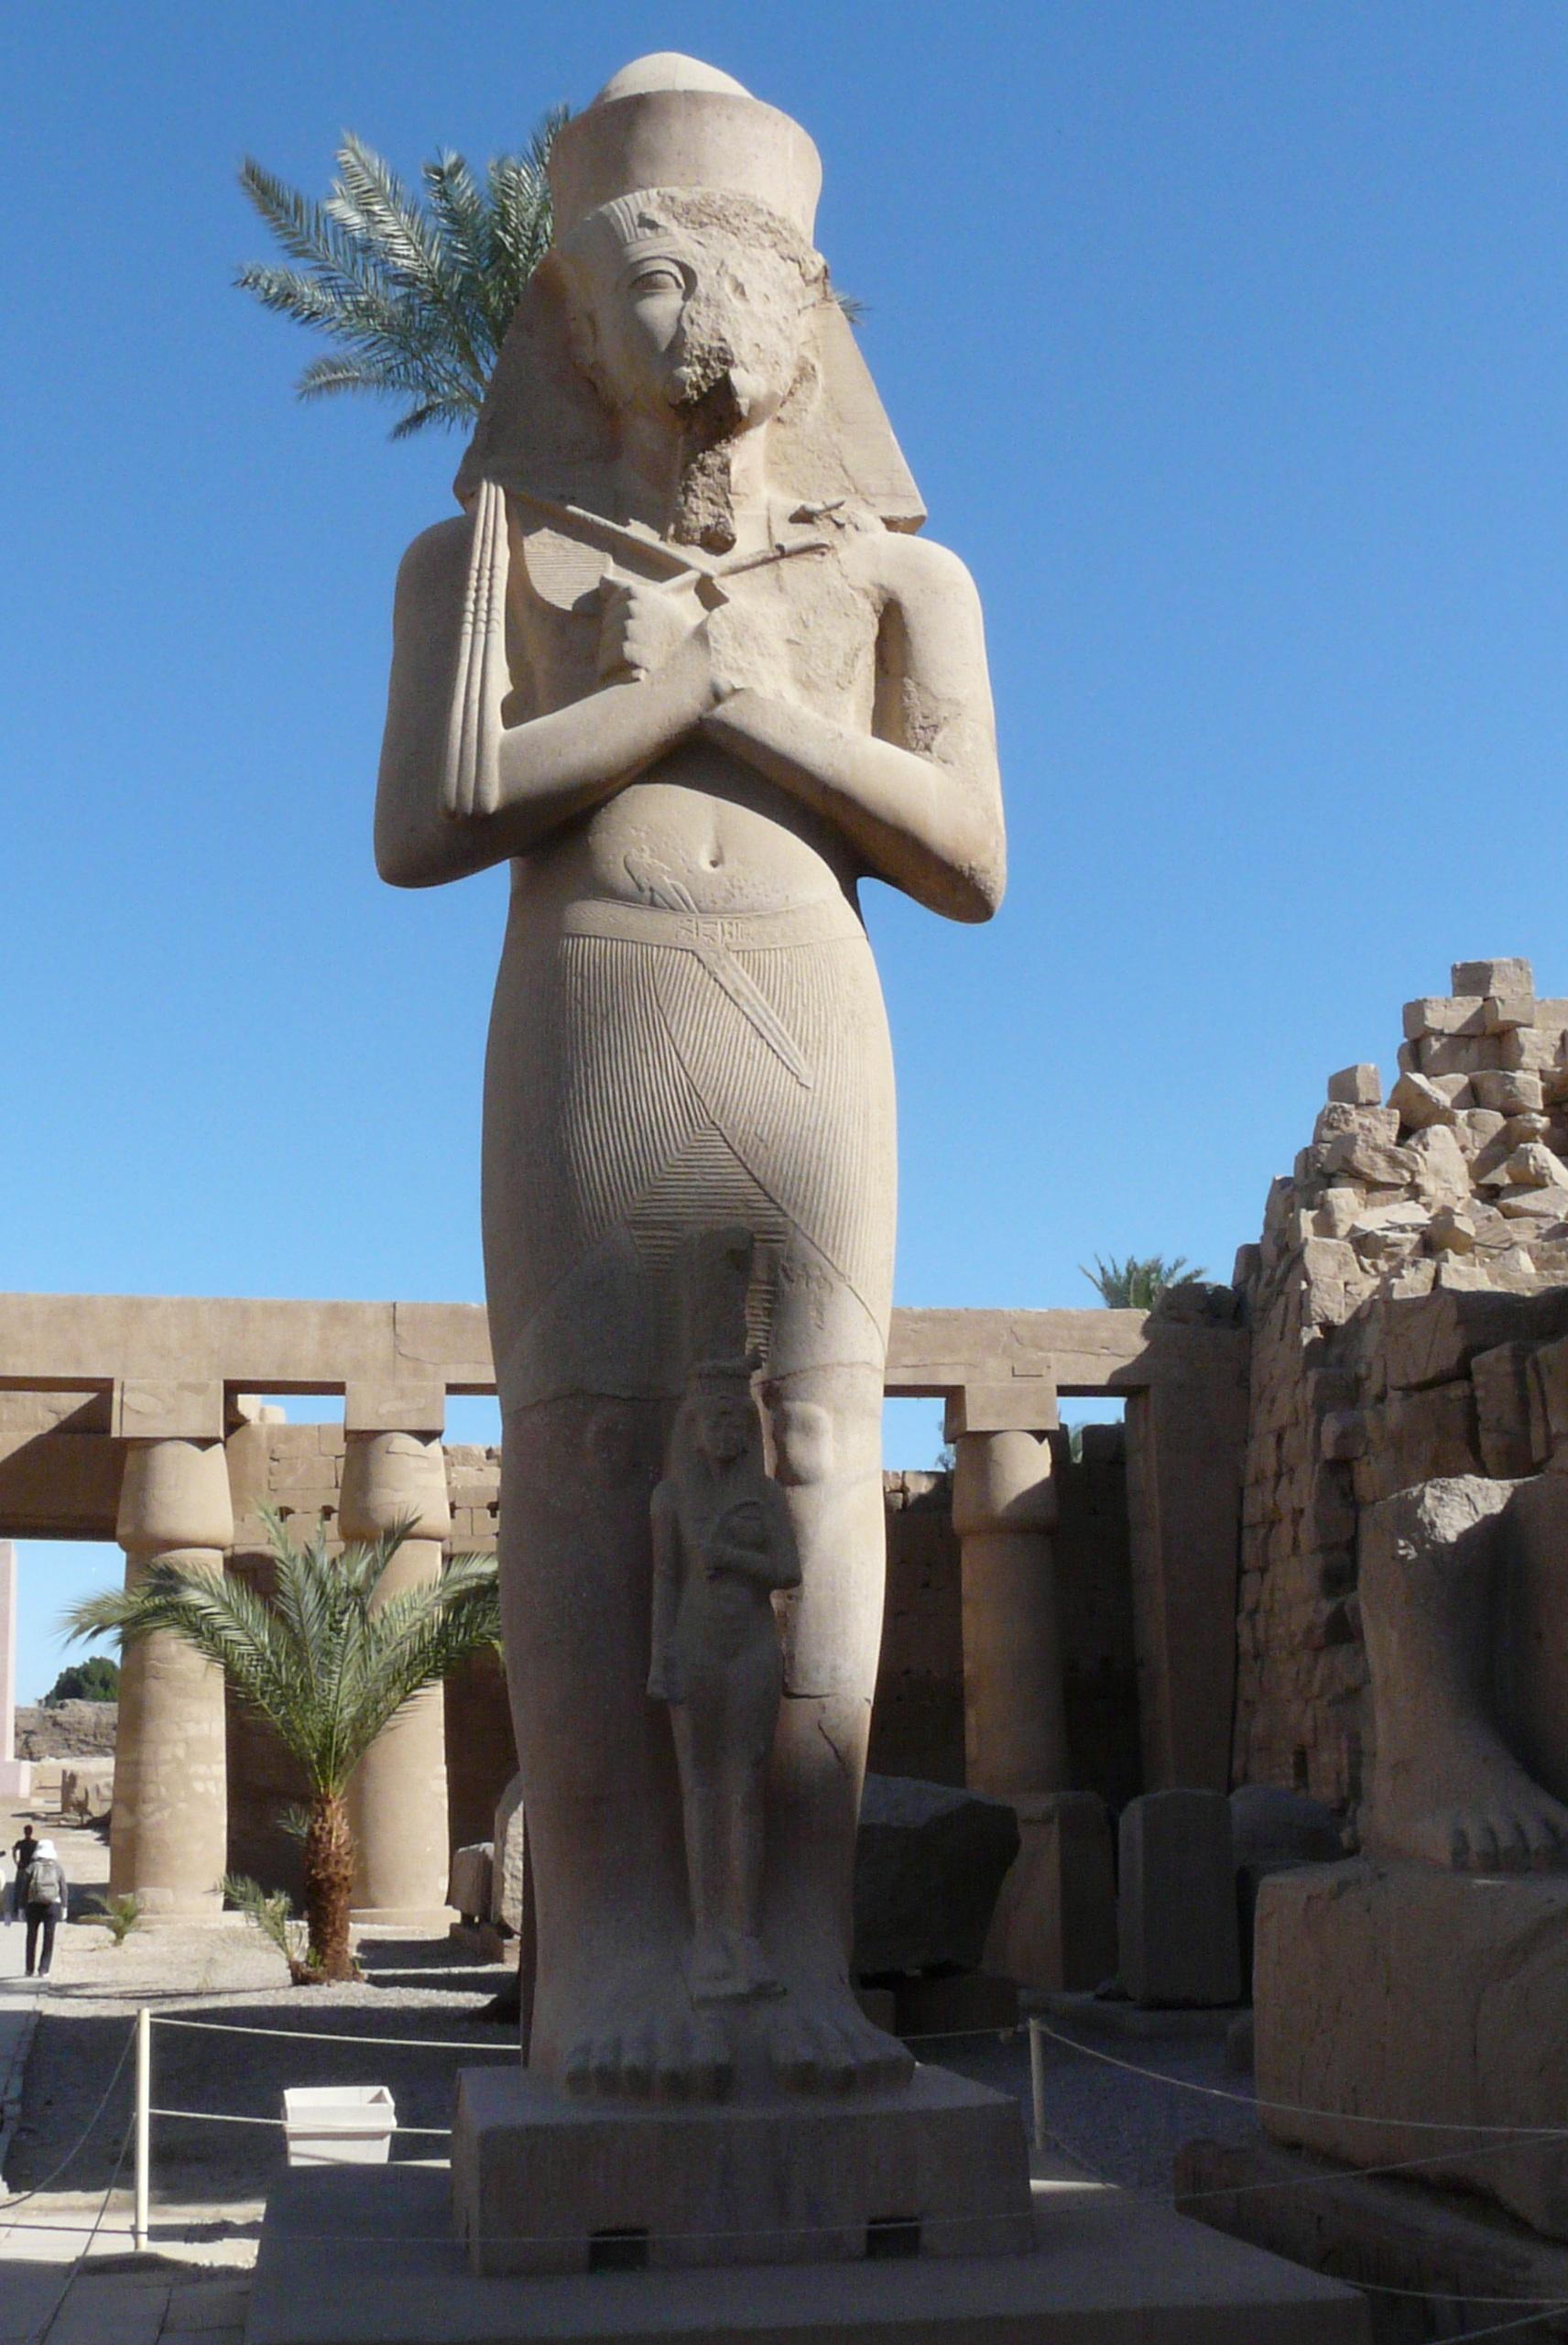 вместе картинки египет статуи компонентами